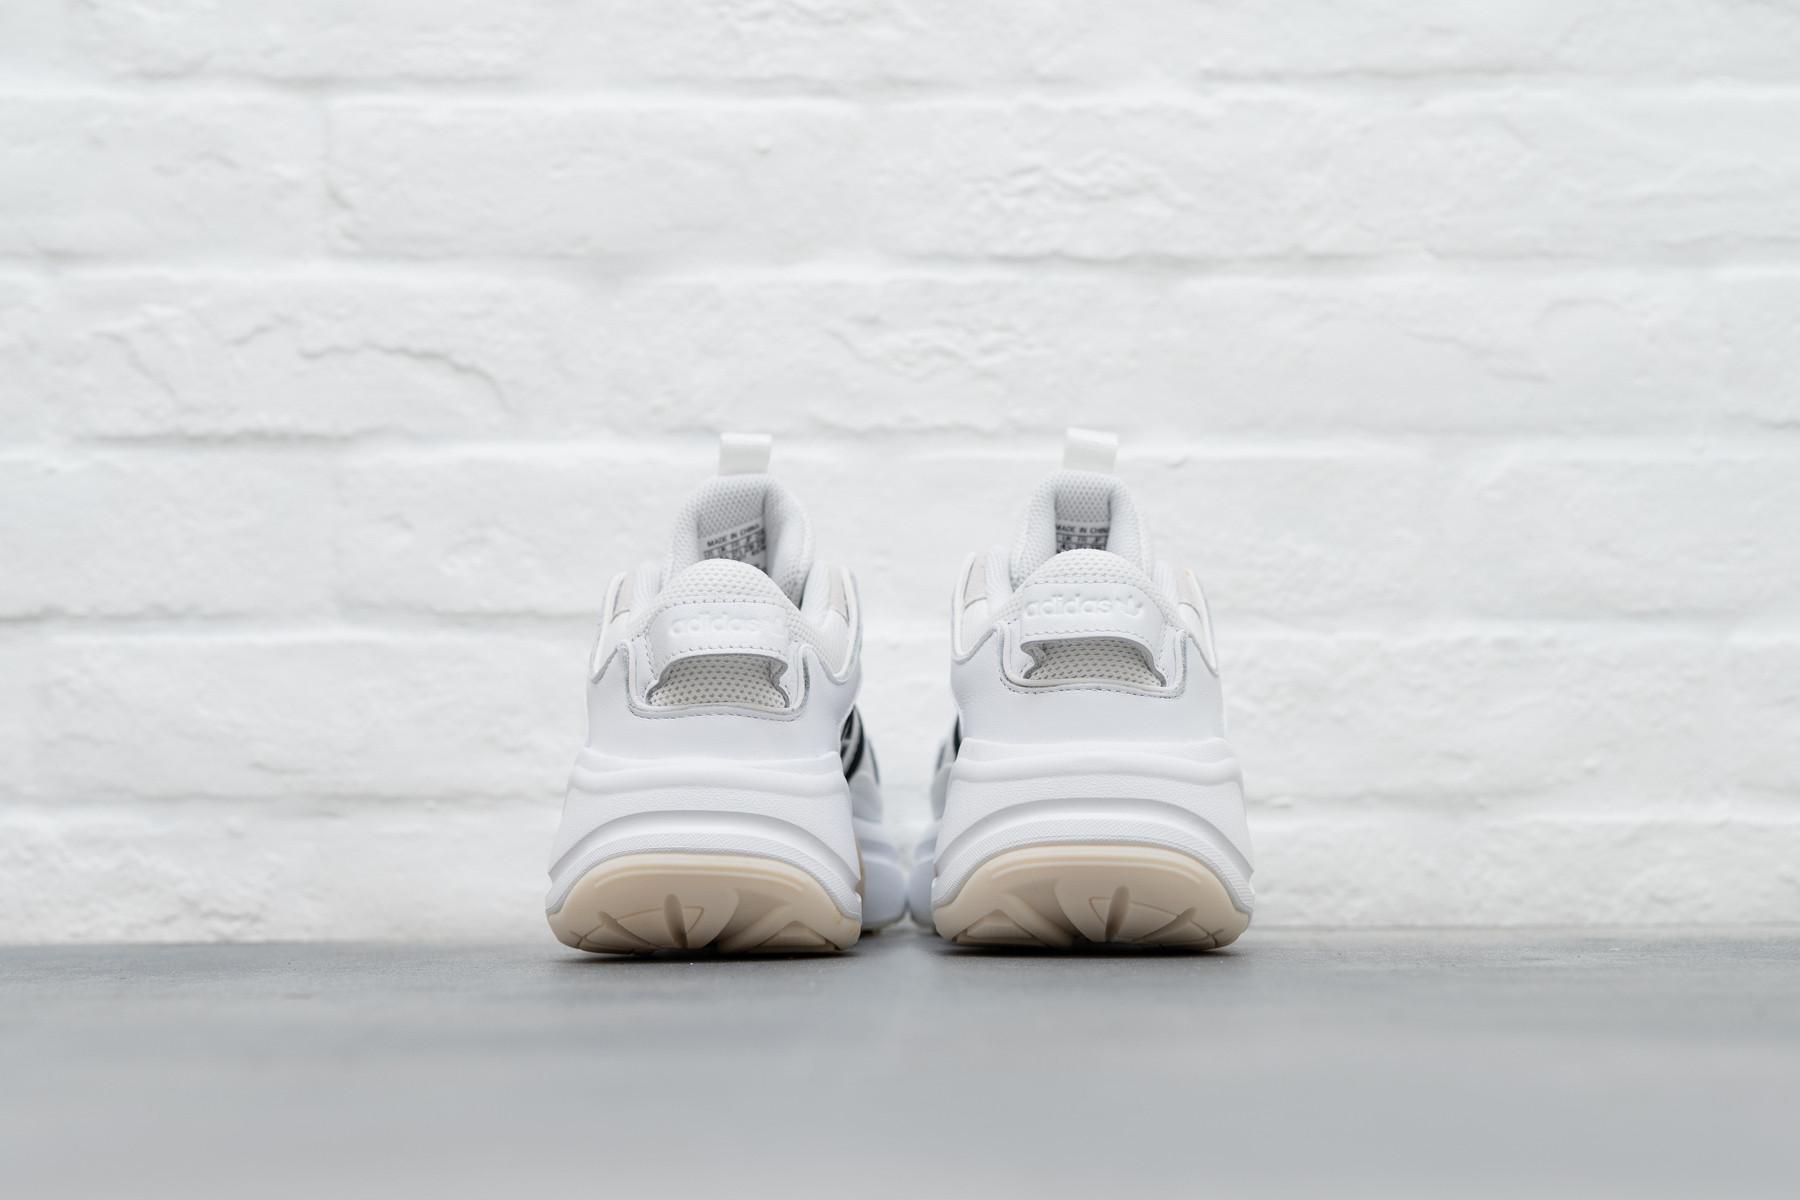 W Adidas Magmur Runner Sneaker.no